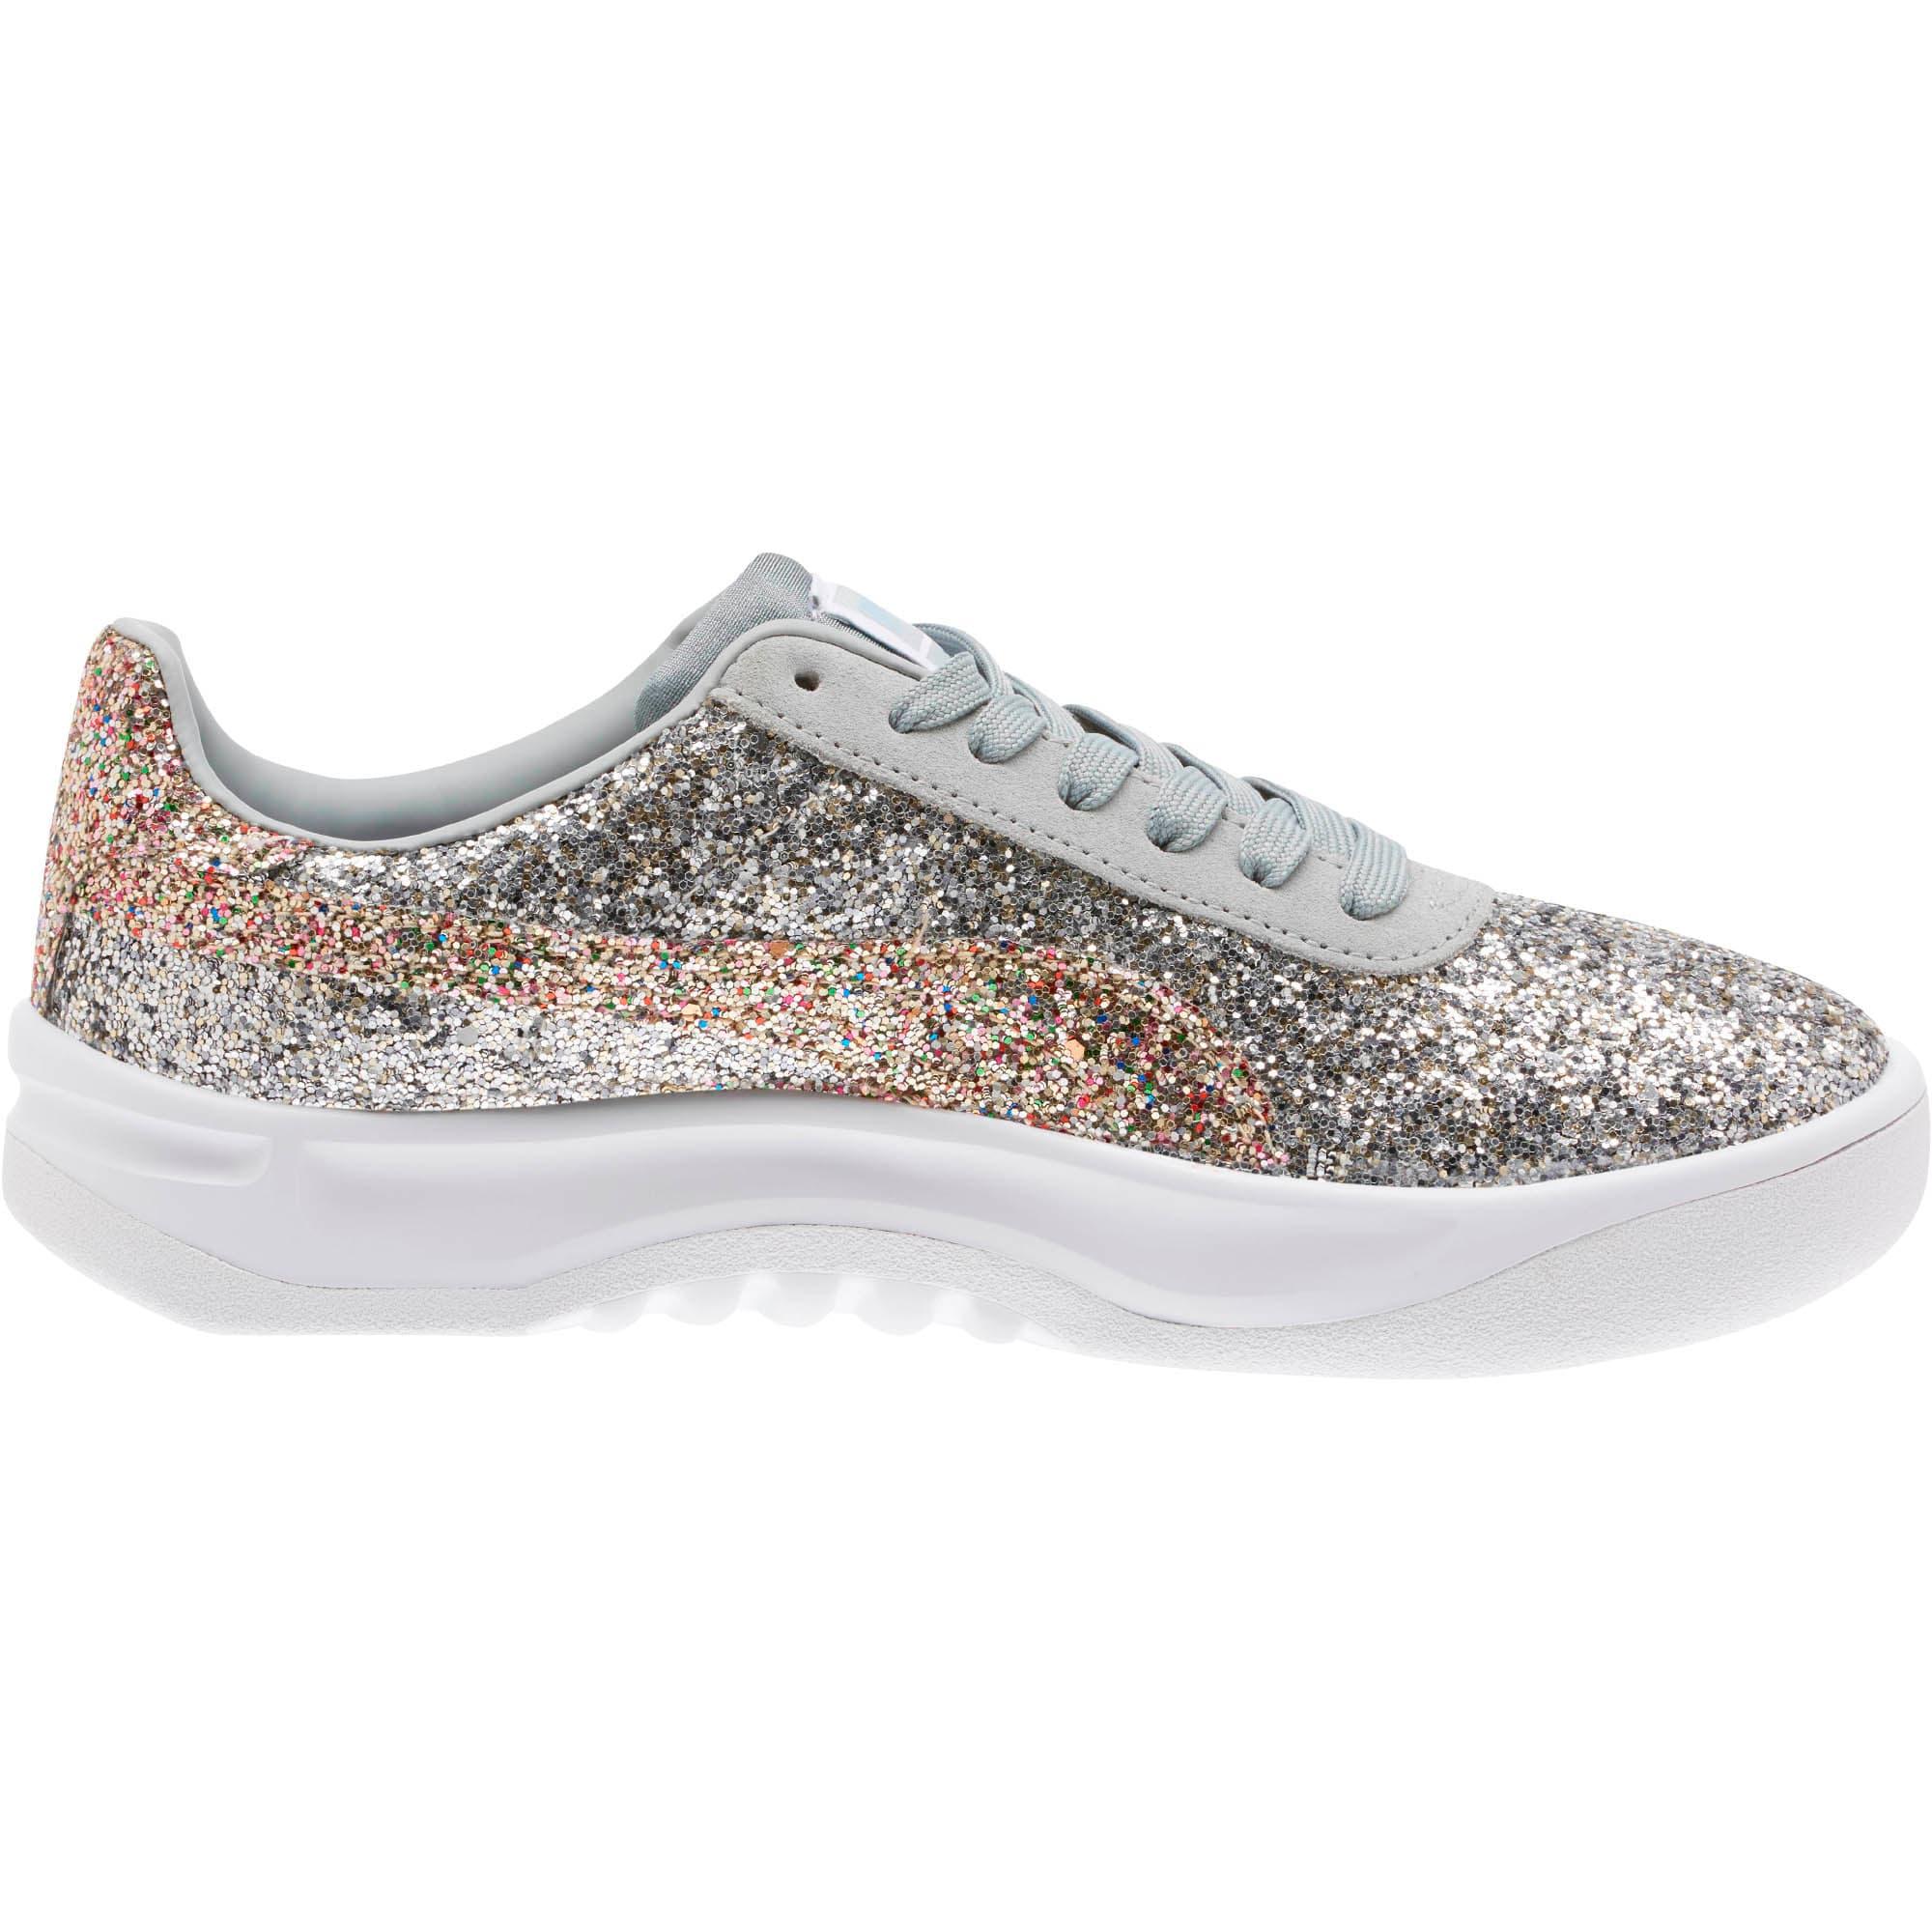 Thumbnail 3 of California Glitz Women's Sneakers, Silver-CERULEAN-Quarry, medium